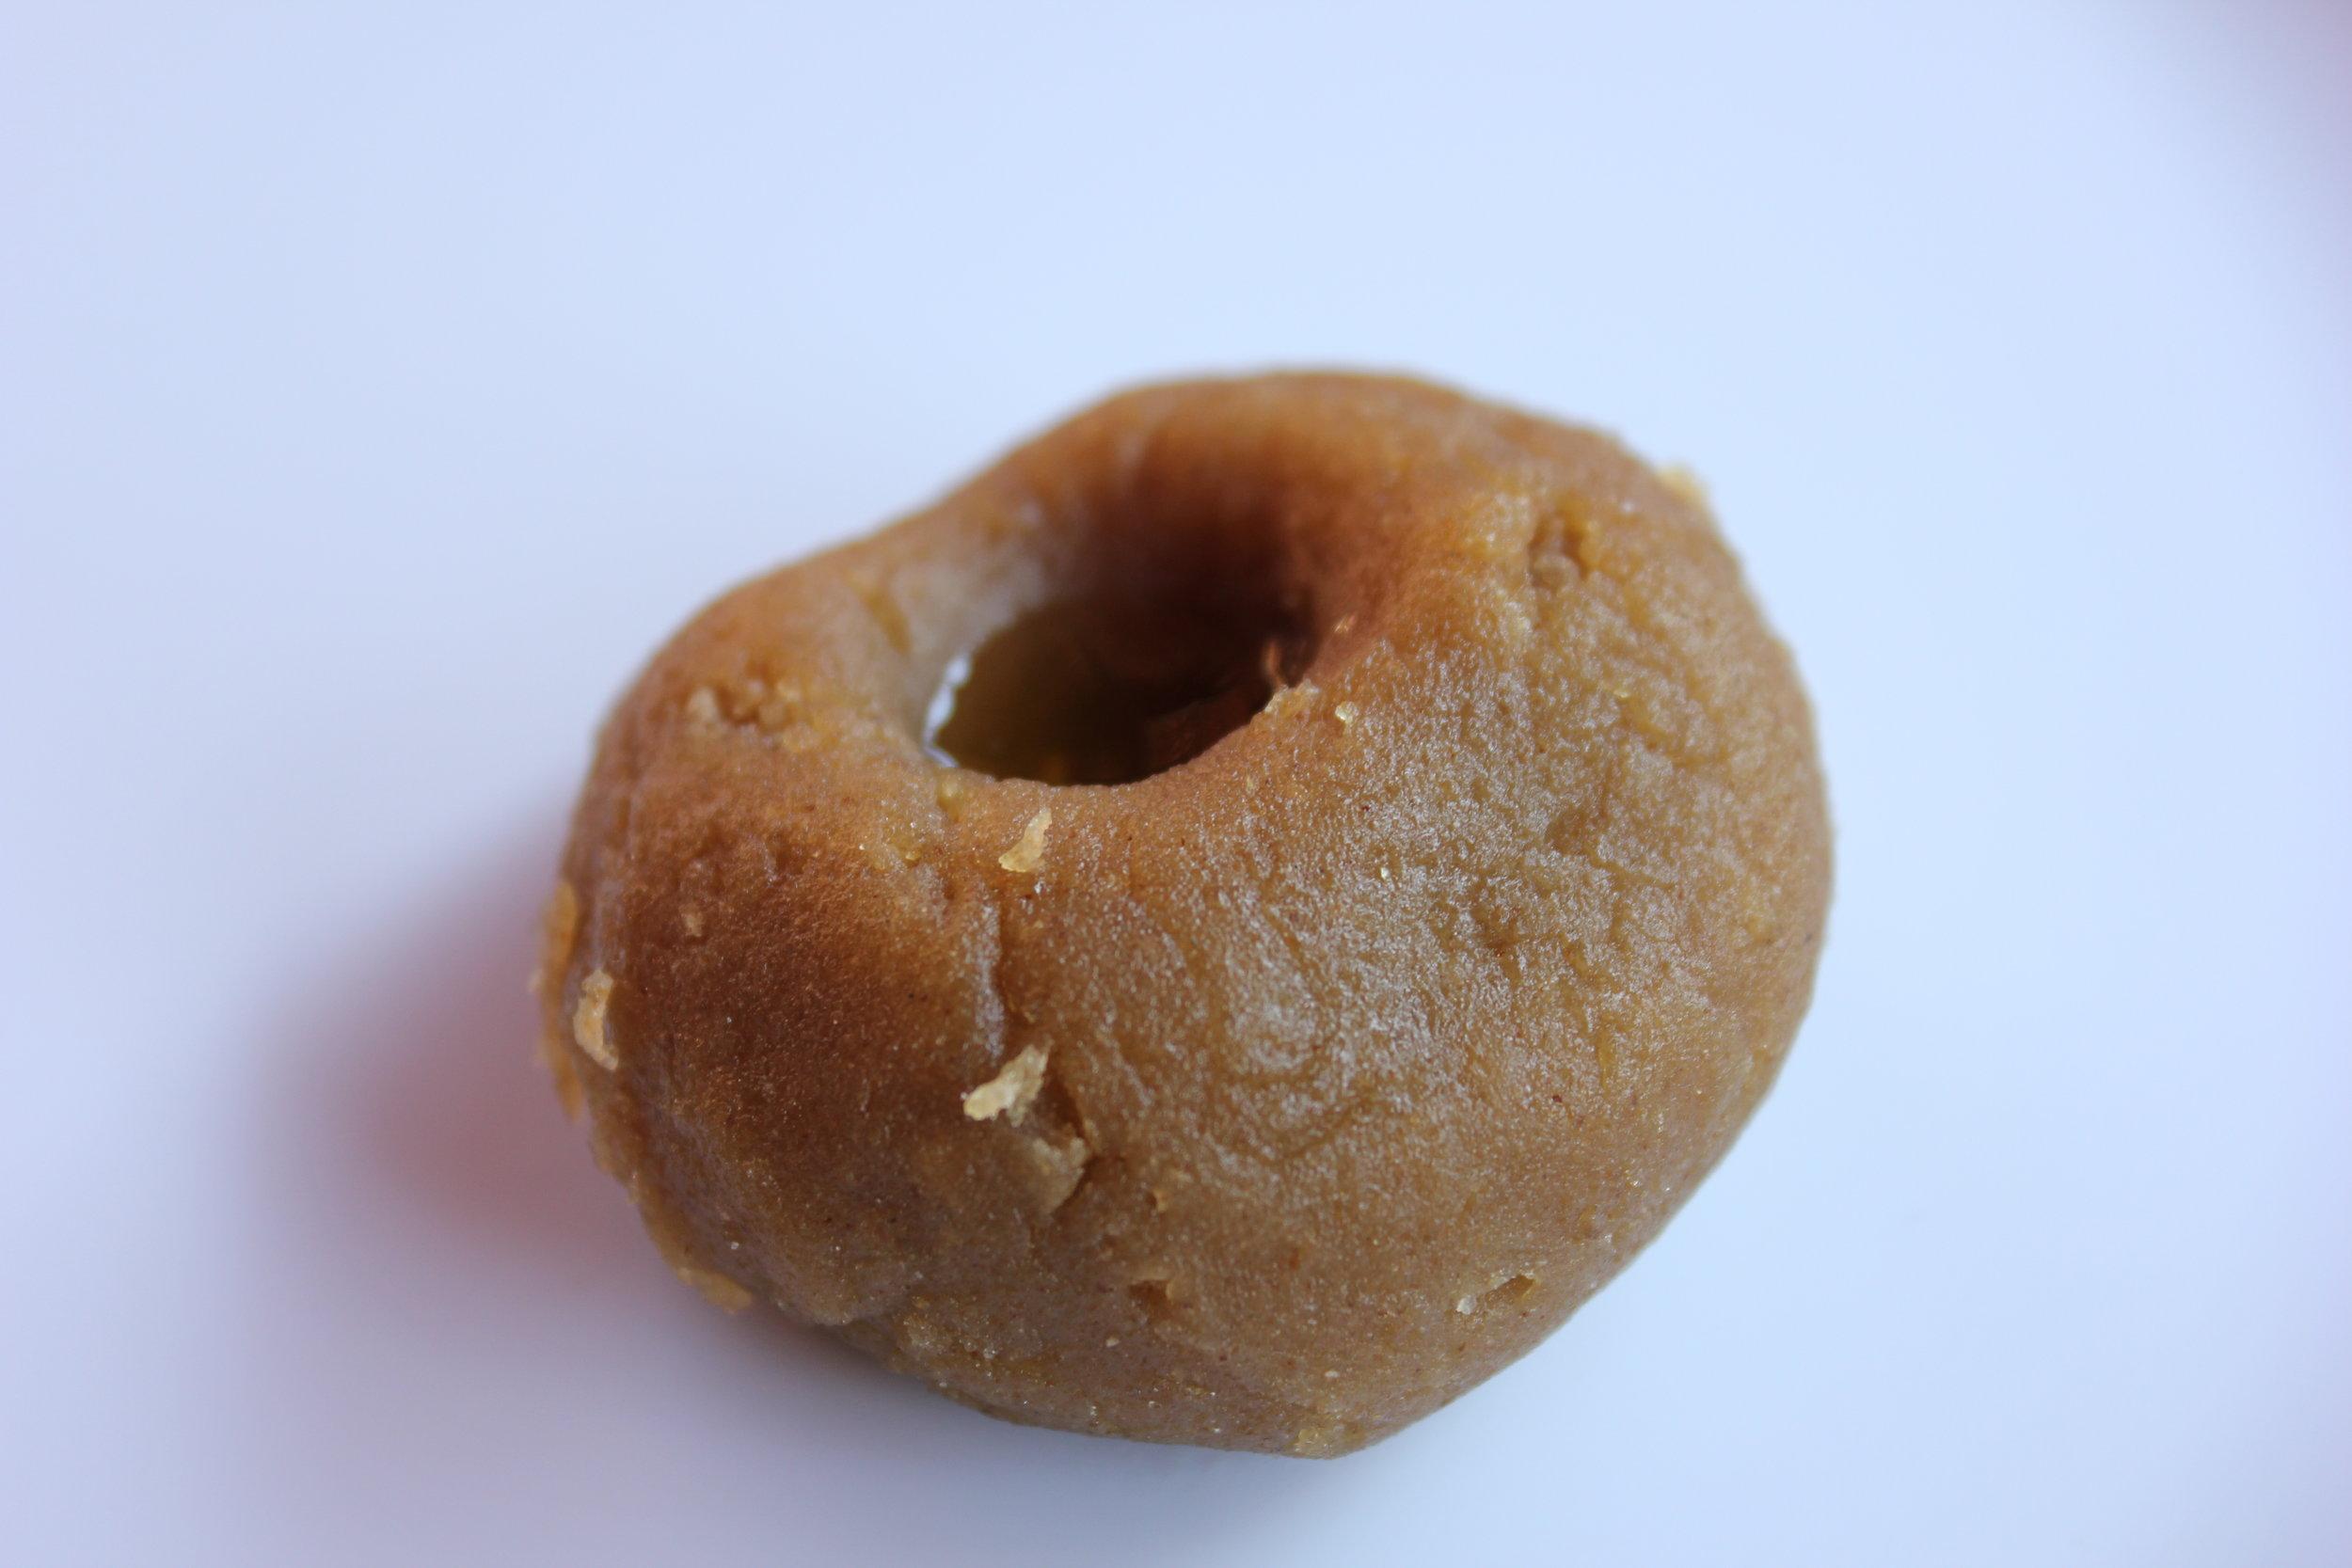 Menthe hittu, ragi and jaggery balls - Karnataka food - Kannadiga food